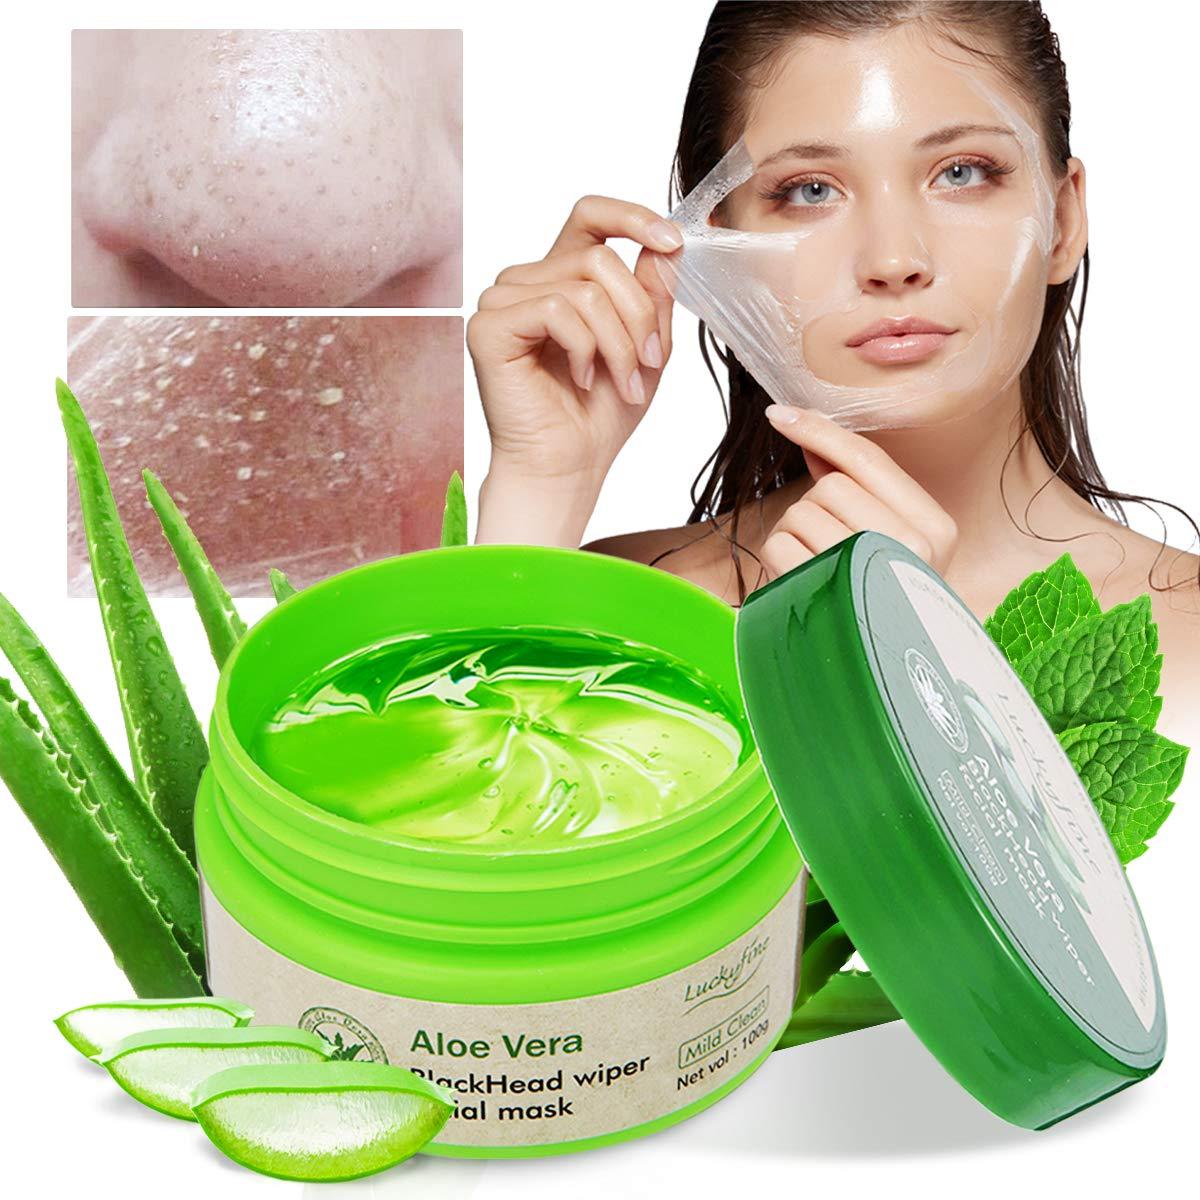 Aloe Mask, Aloe Vera Peel Off Blackhead Remover Mask -Facial Mask- Peel off Face Masks-Aloe Vera Extract Facial Mask- Oil Control - Facial Moisturizing - Moisture Skin